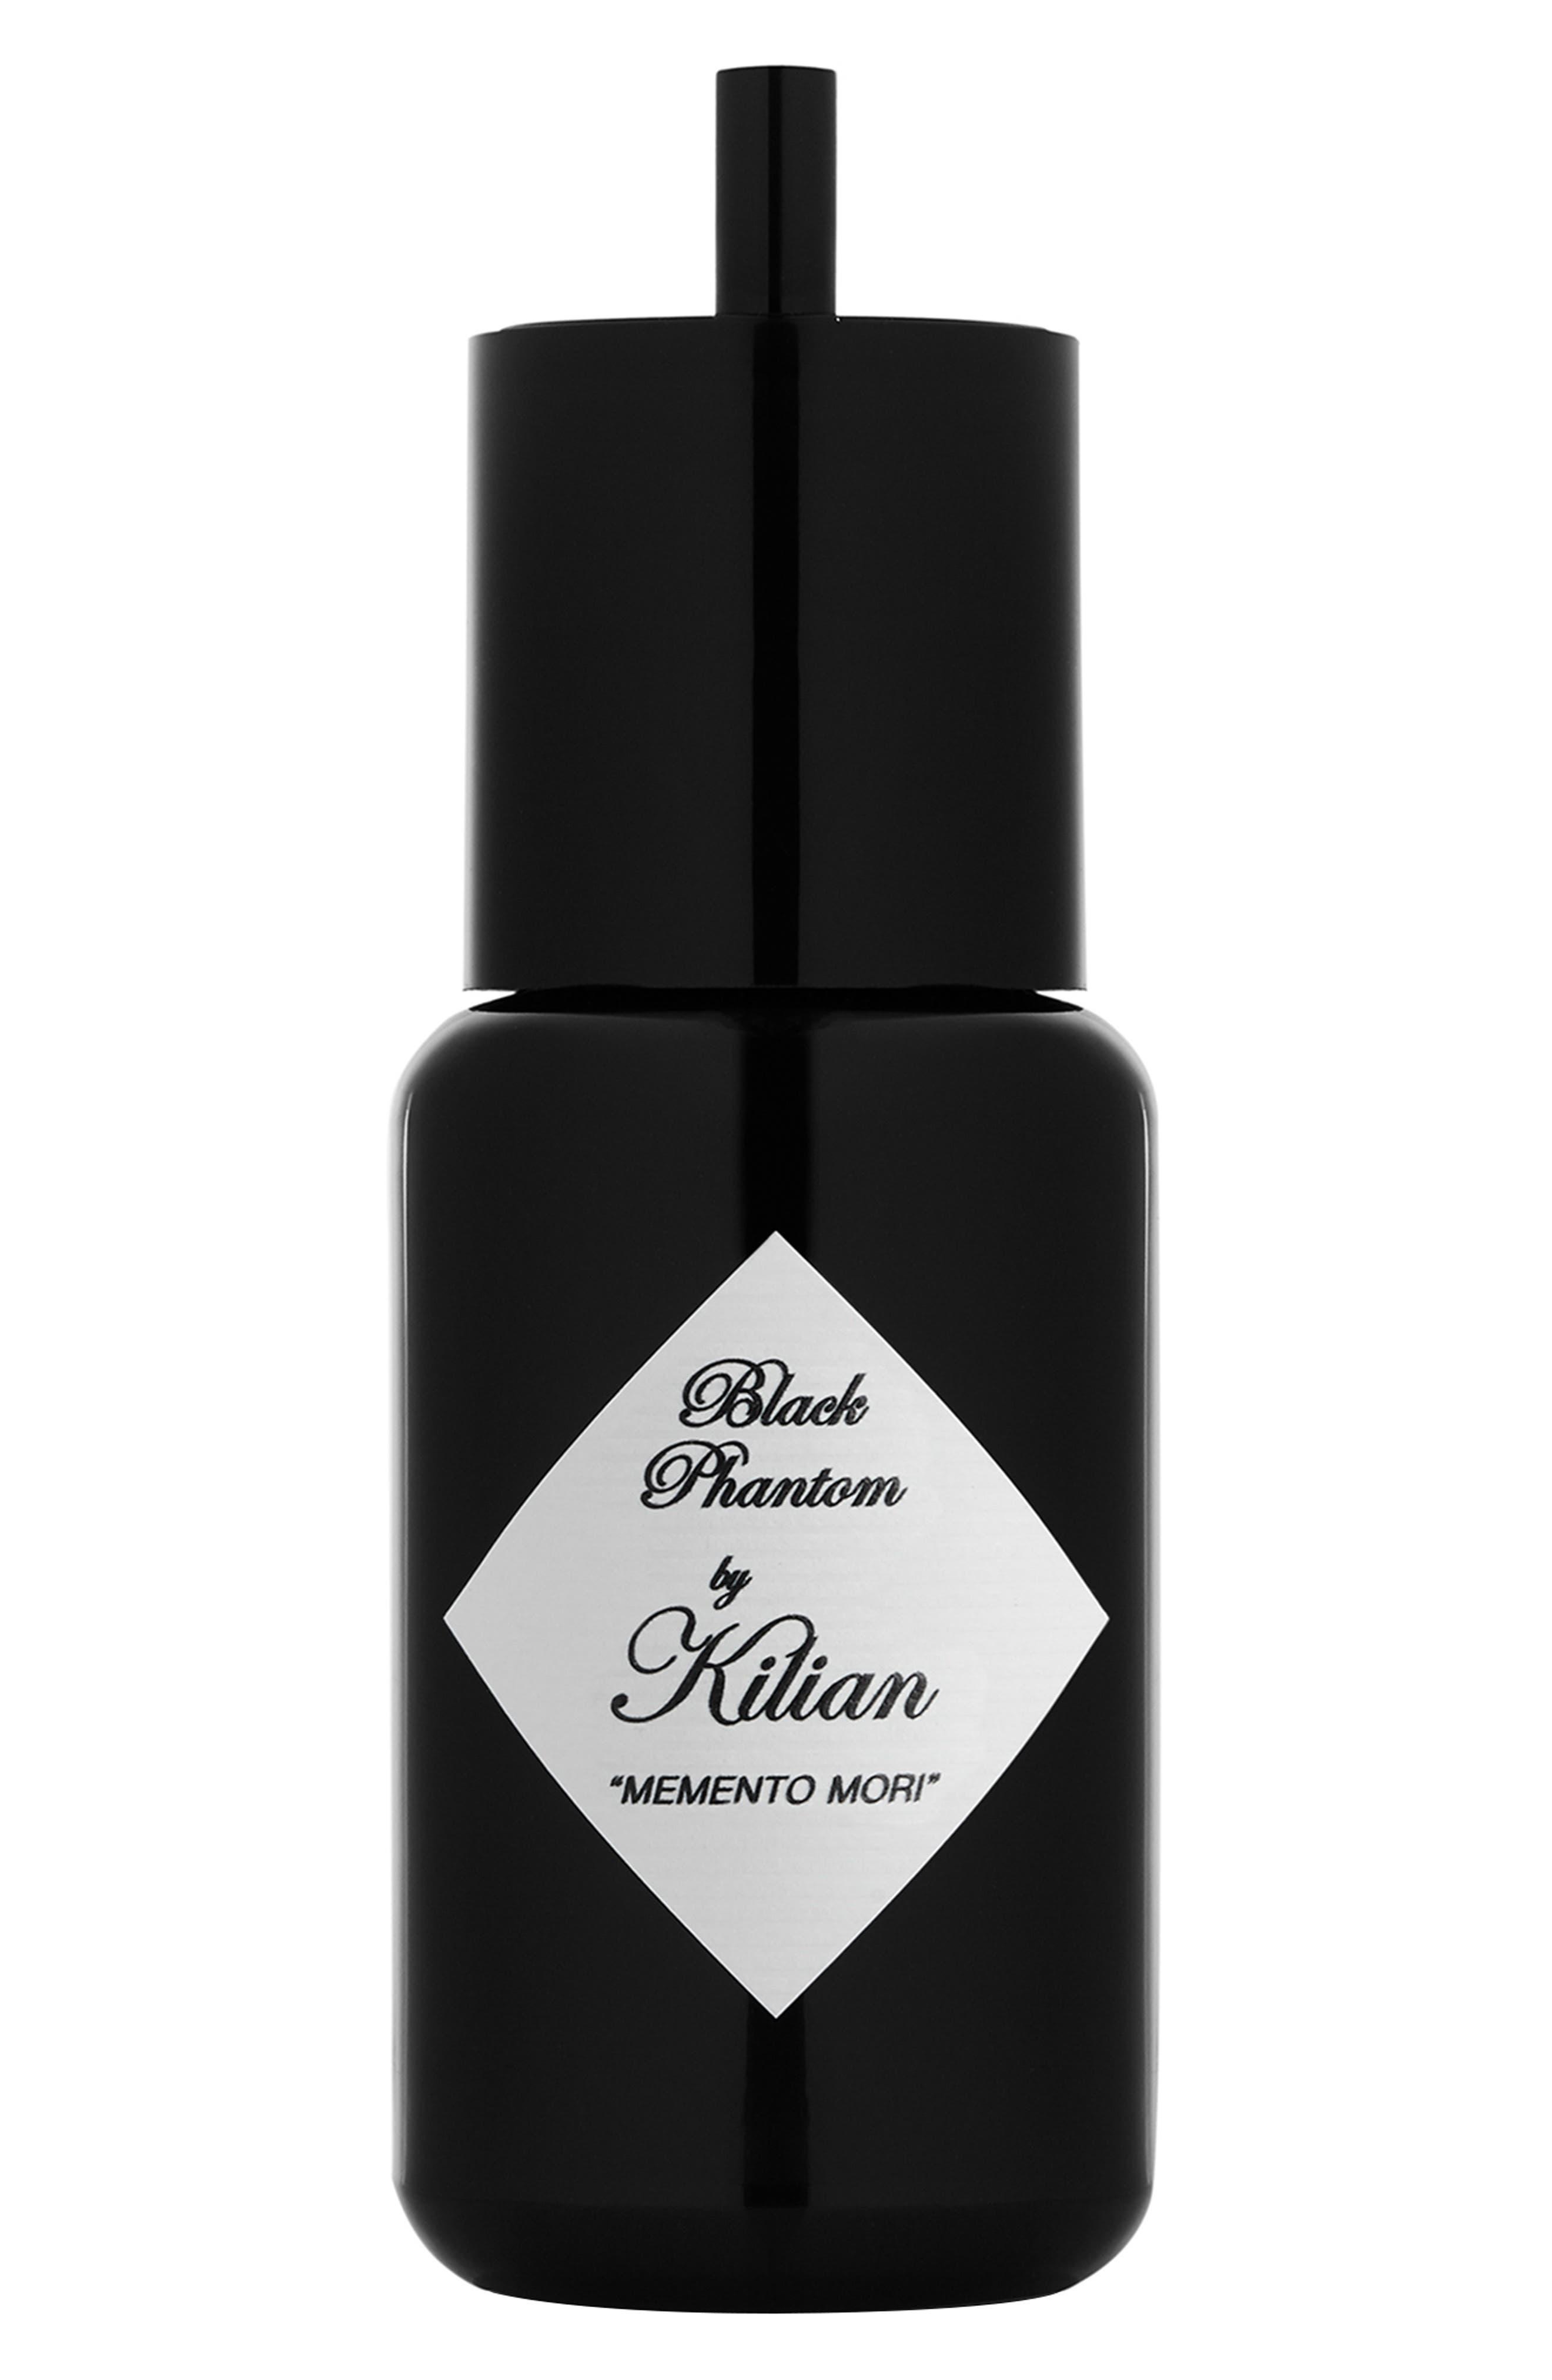 By Kilian Black Phantom Memento Mori Fragrance Refill,                             Main thumbnail 1, color,                             NO COLOR